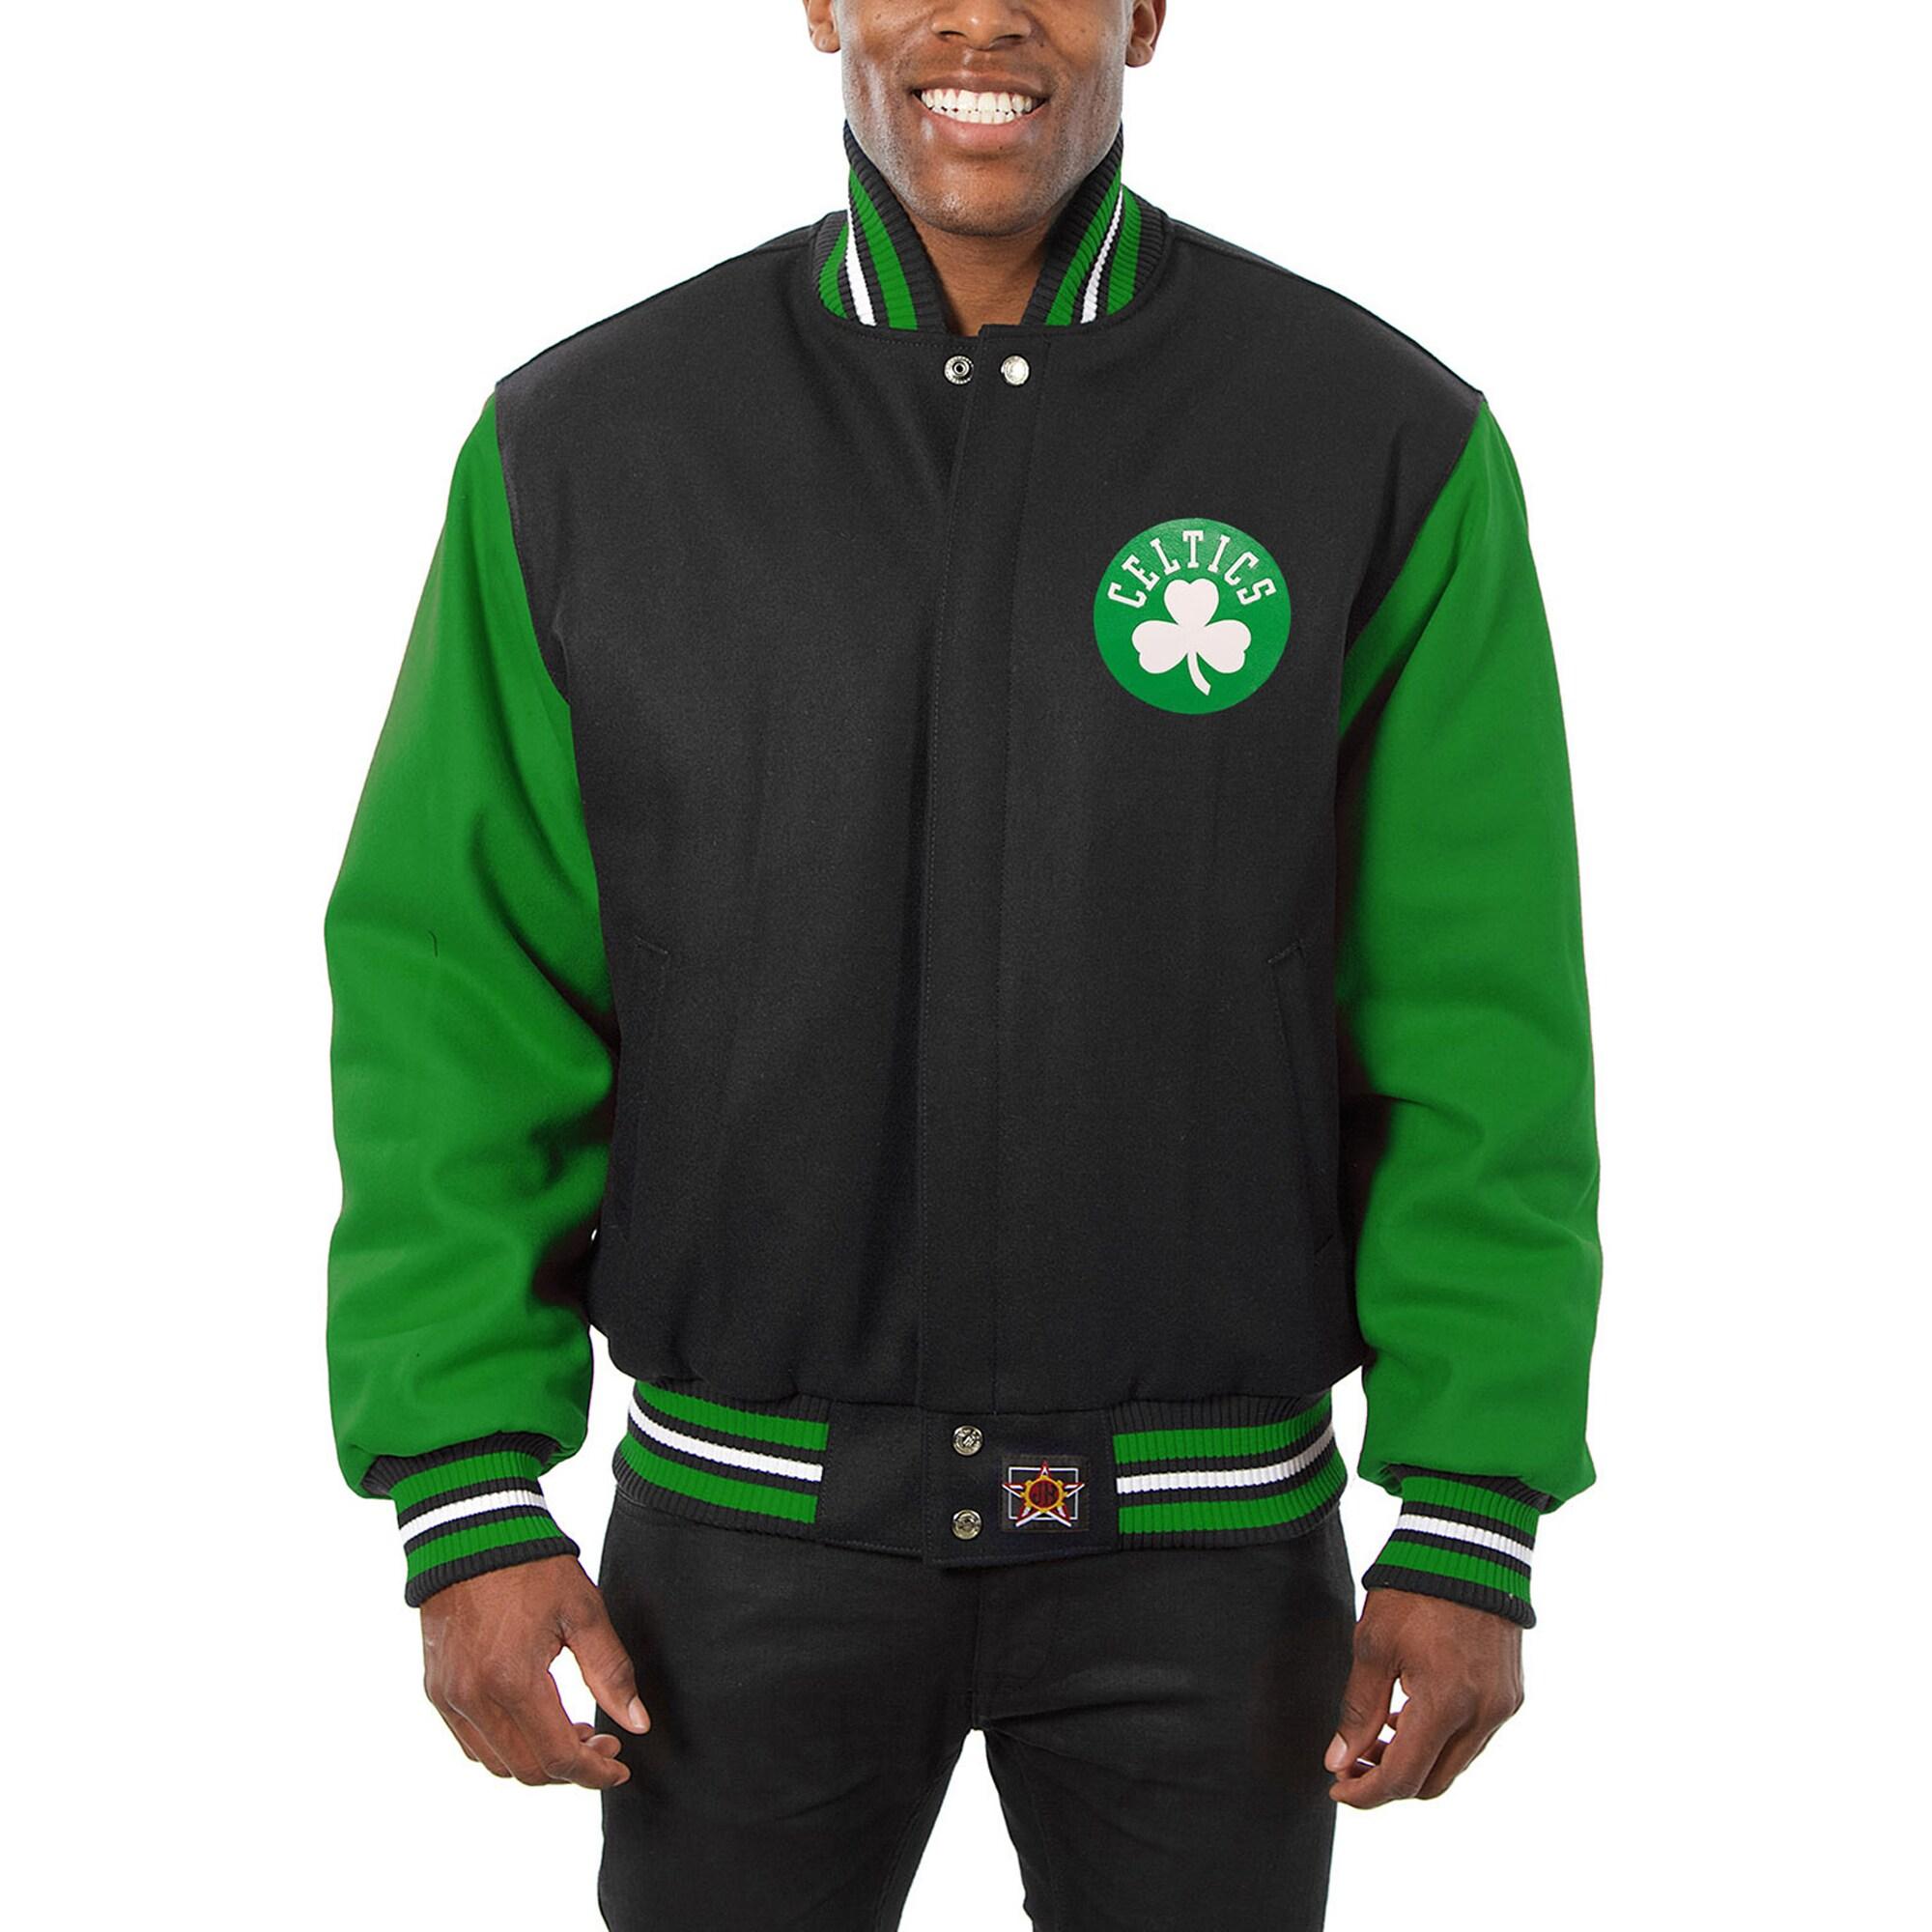 Boston Celtics JH Design Domestic Two-Tone Wool Jacket - Black